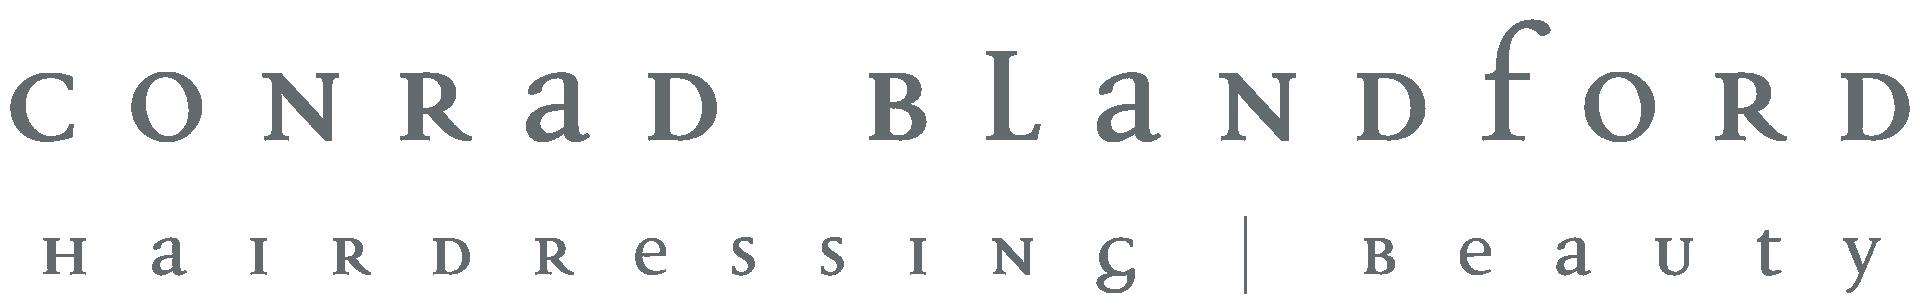 Conrad Blandford Hairdressing affiliate partner logo